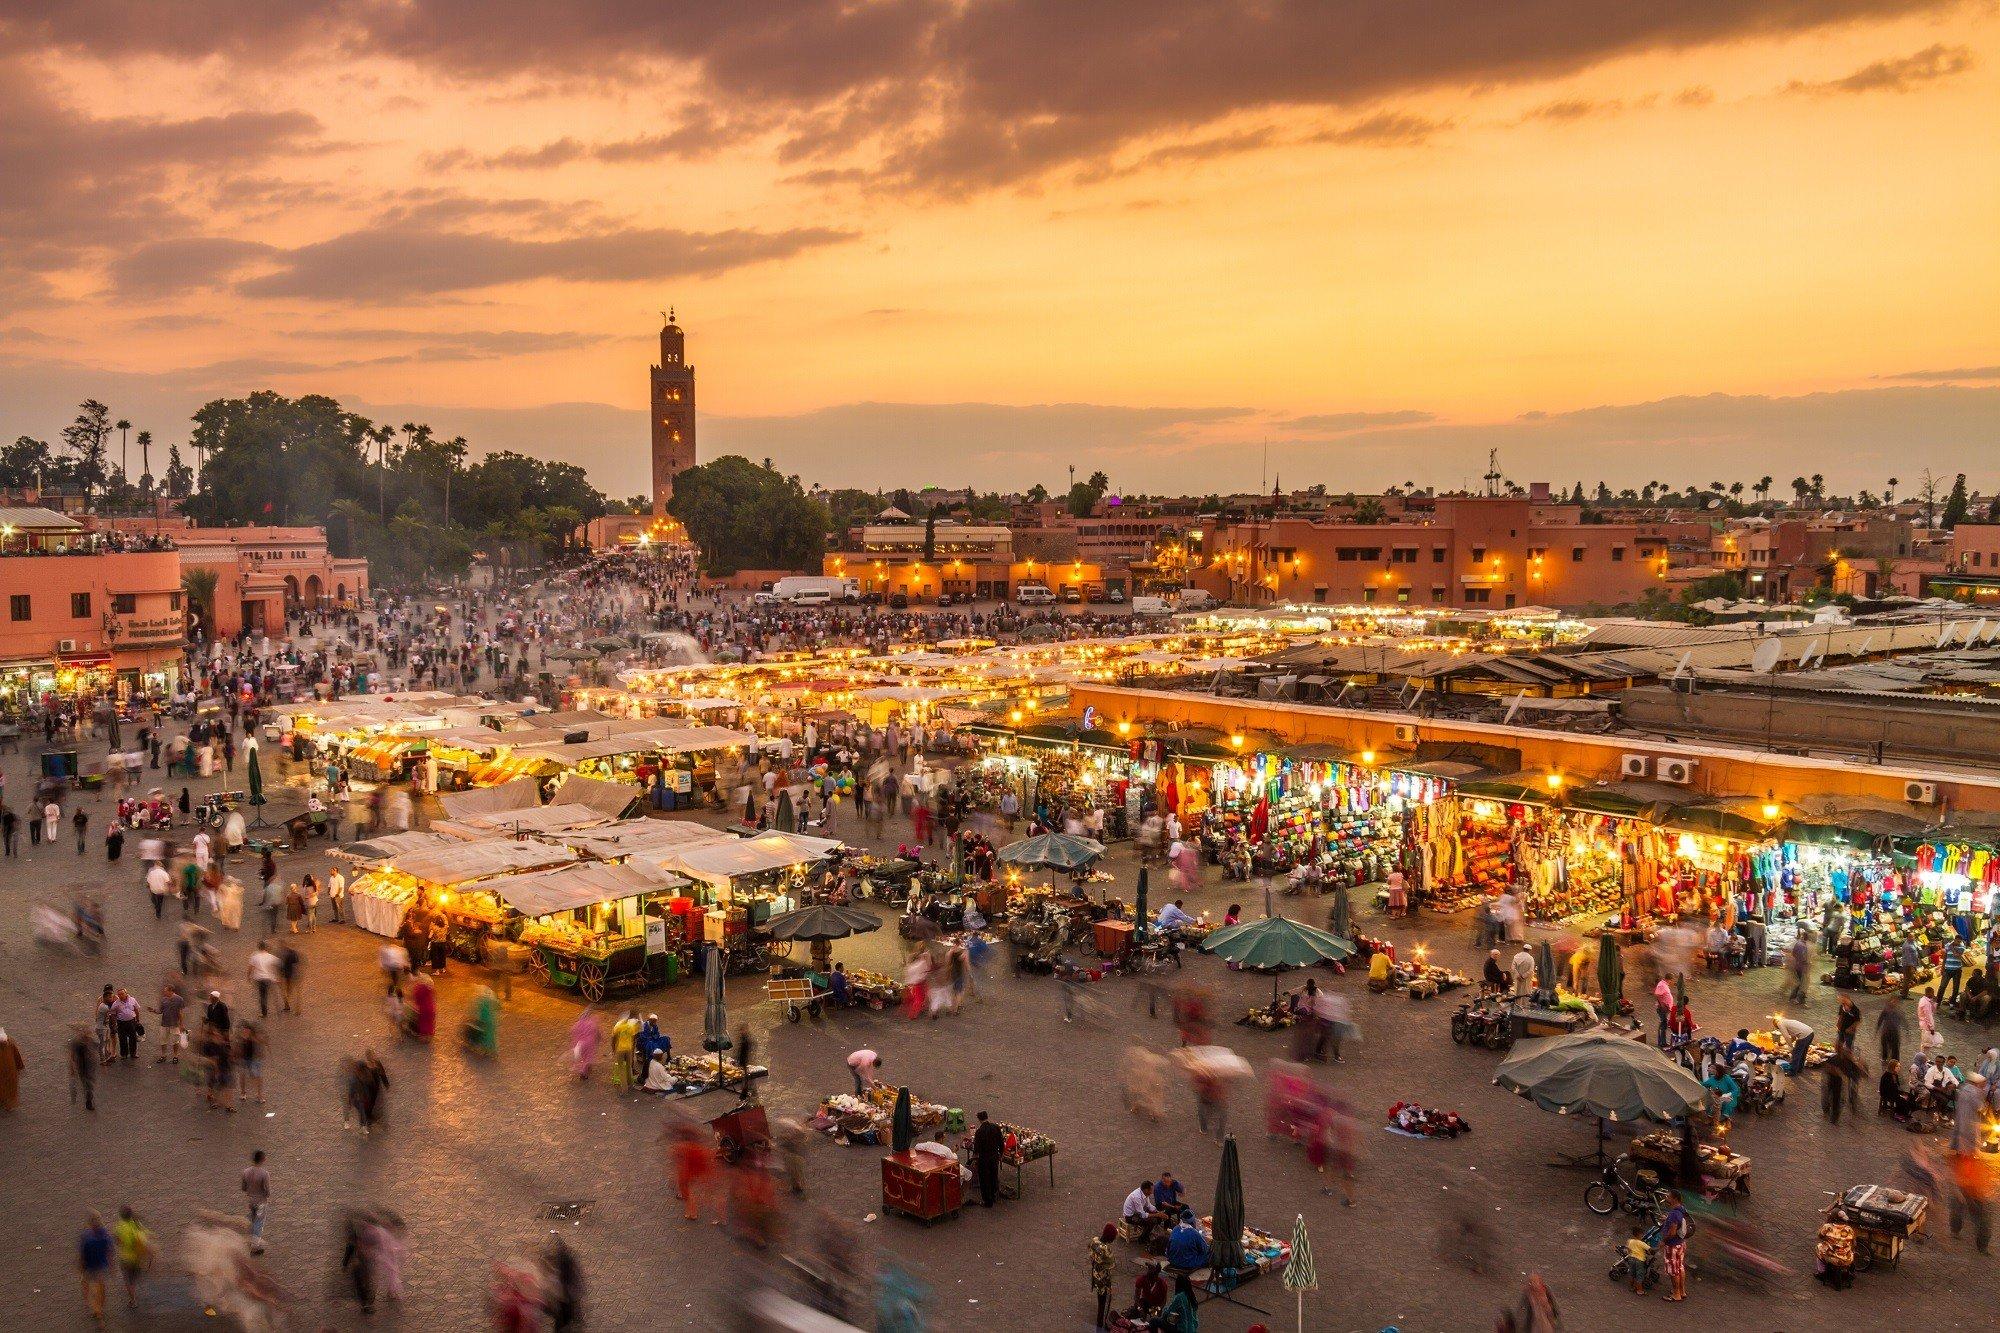 Dagaanbieding - 4-, 5- of 6-daagse stedentrip naar het prachtige Marrakech incl. retourvlucht dagelijkse koopjes